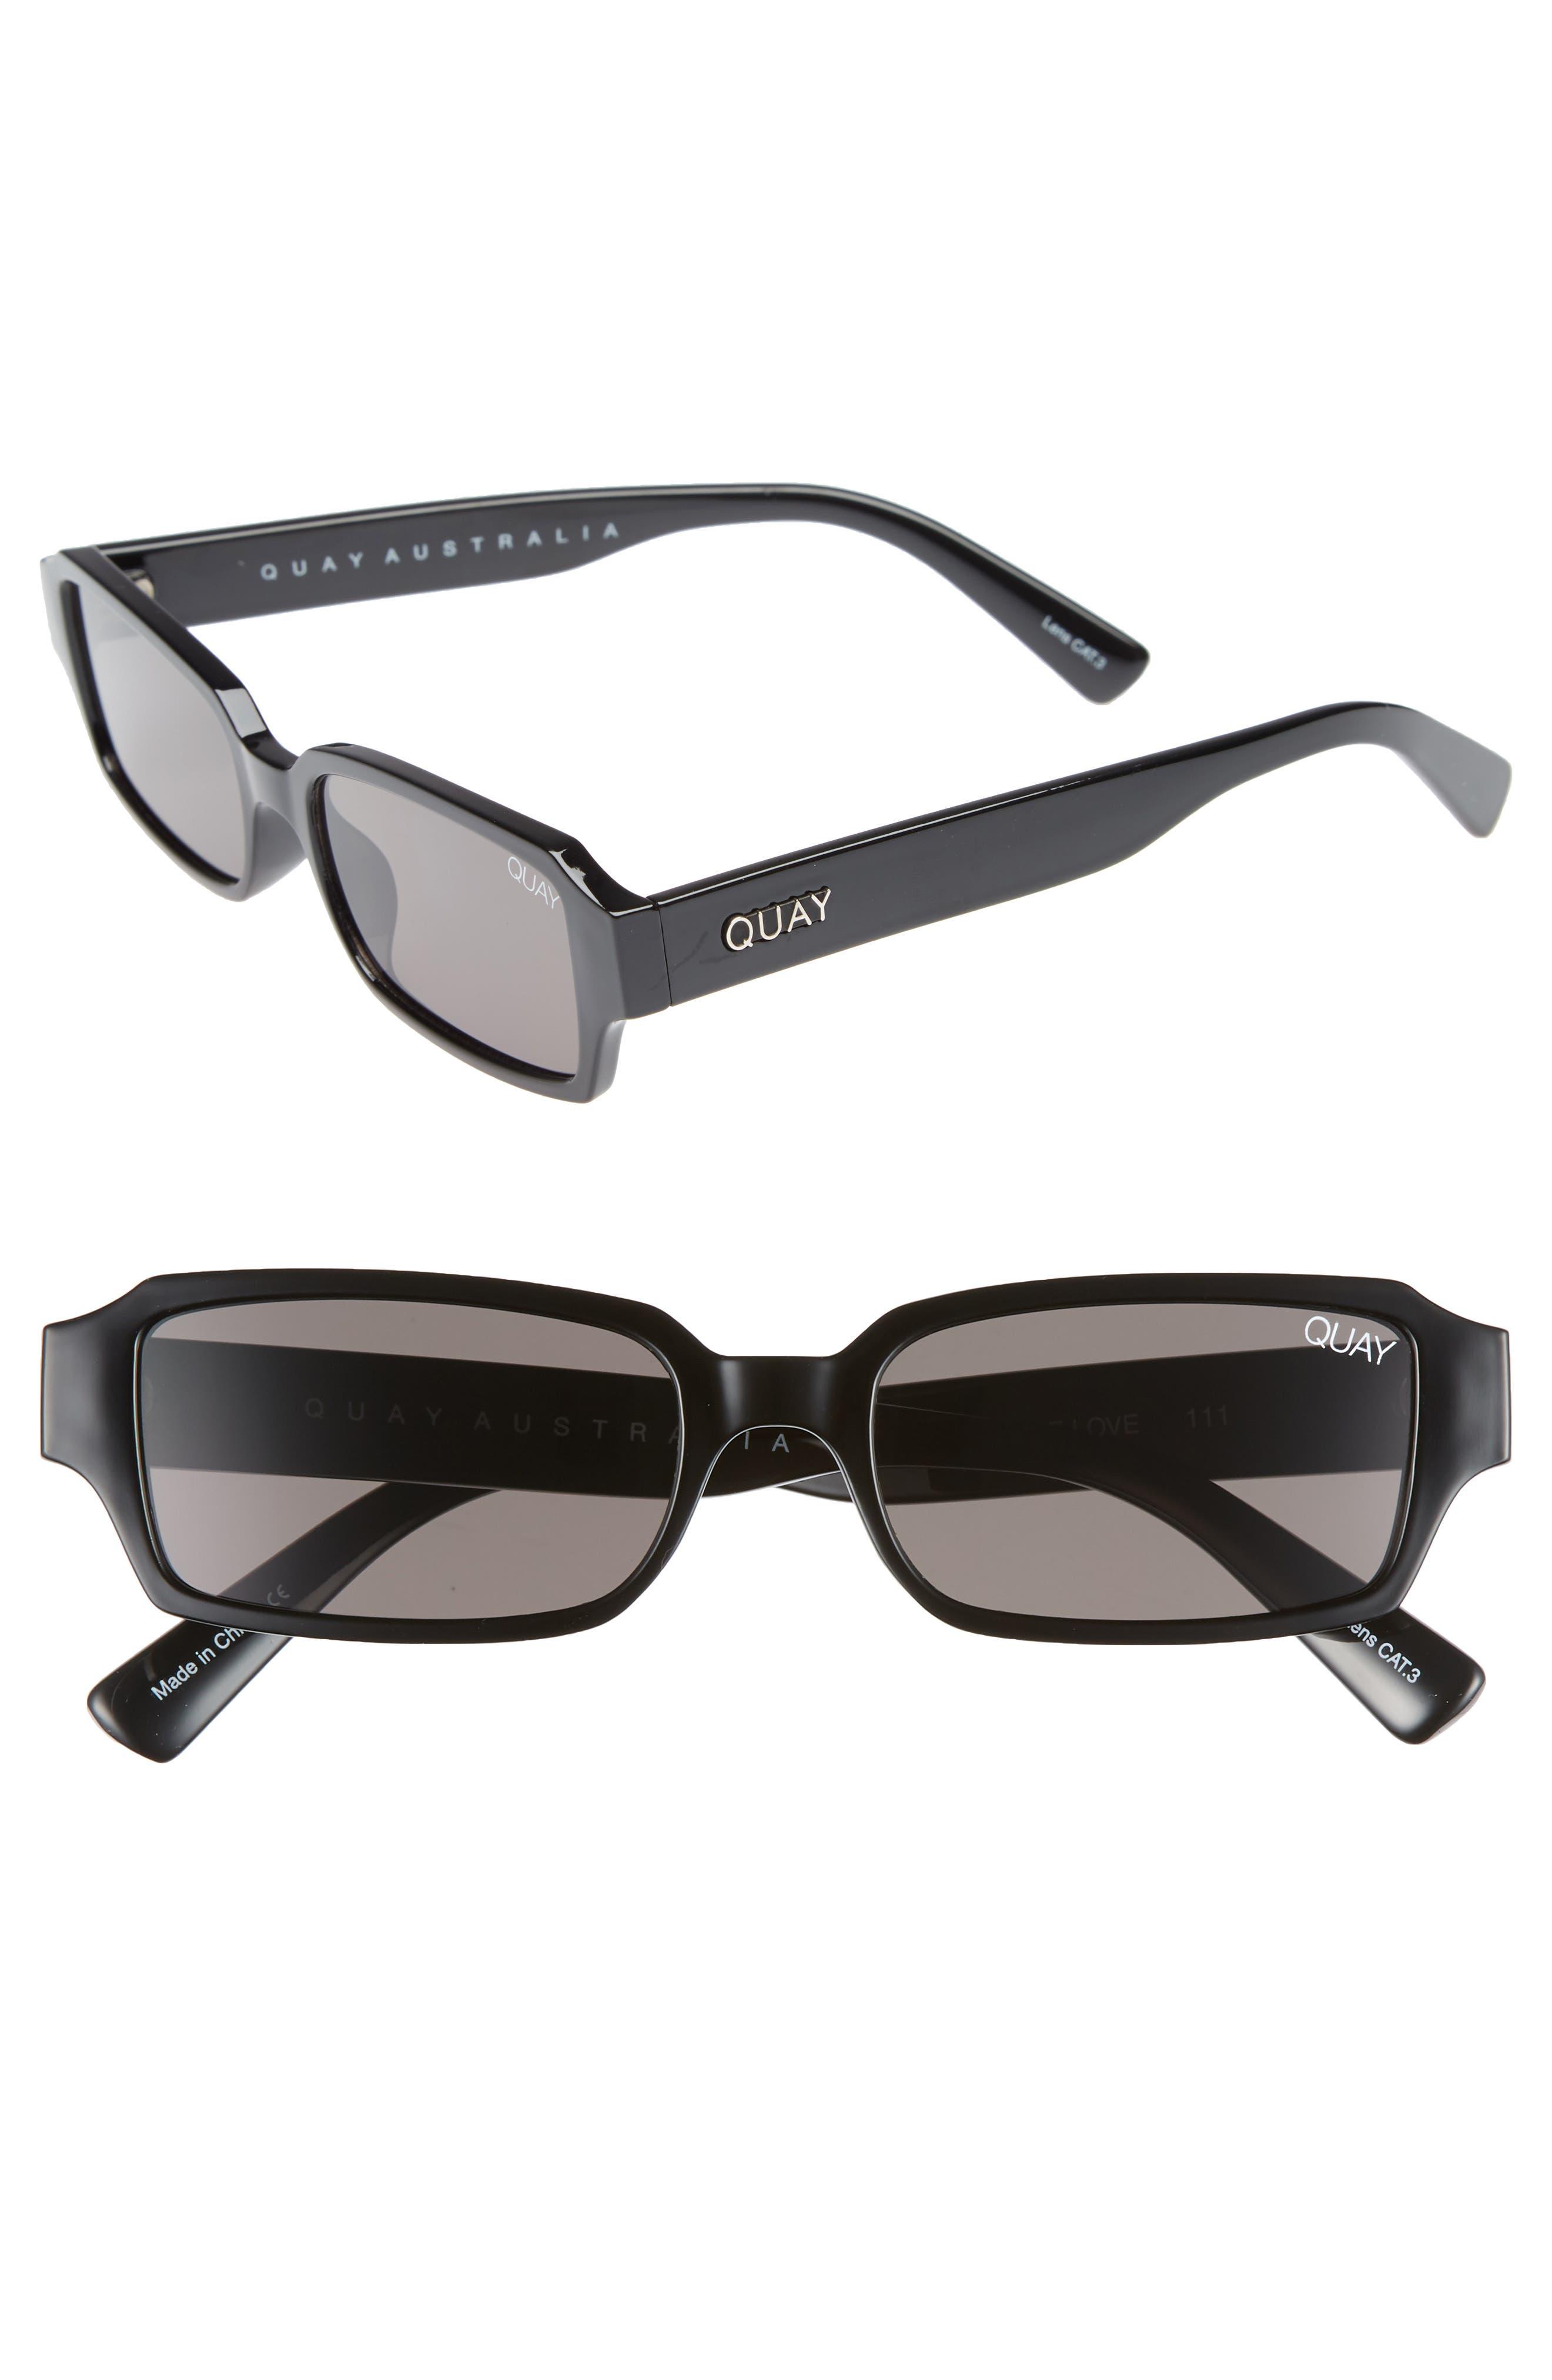 Strange Love 53mm Rectangle Sunglasses,                             Main thumbnail 1, color,                             BLACK/ SMOKE